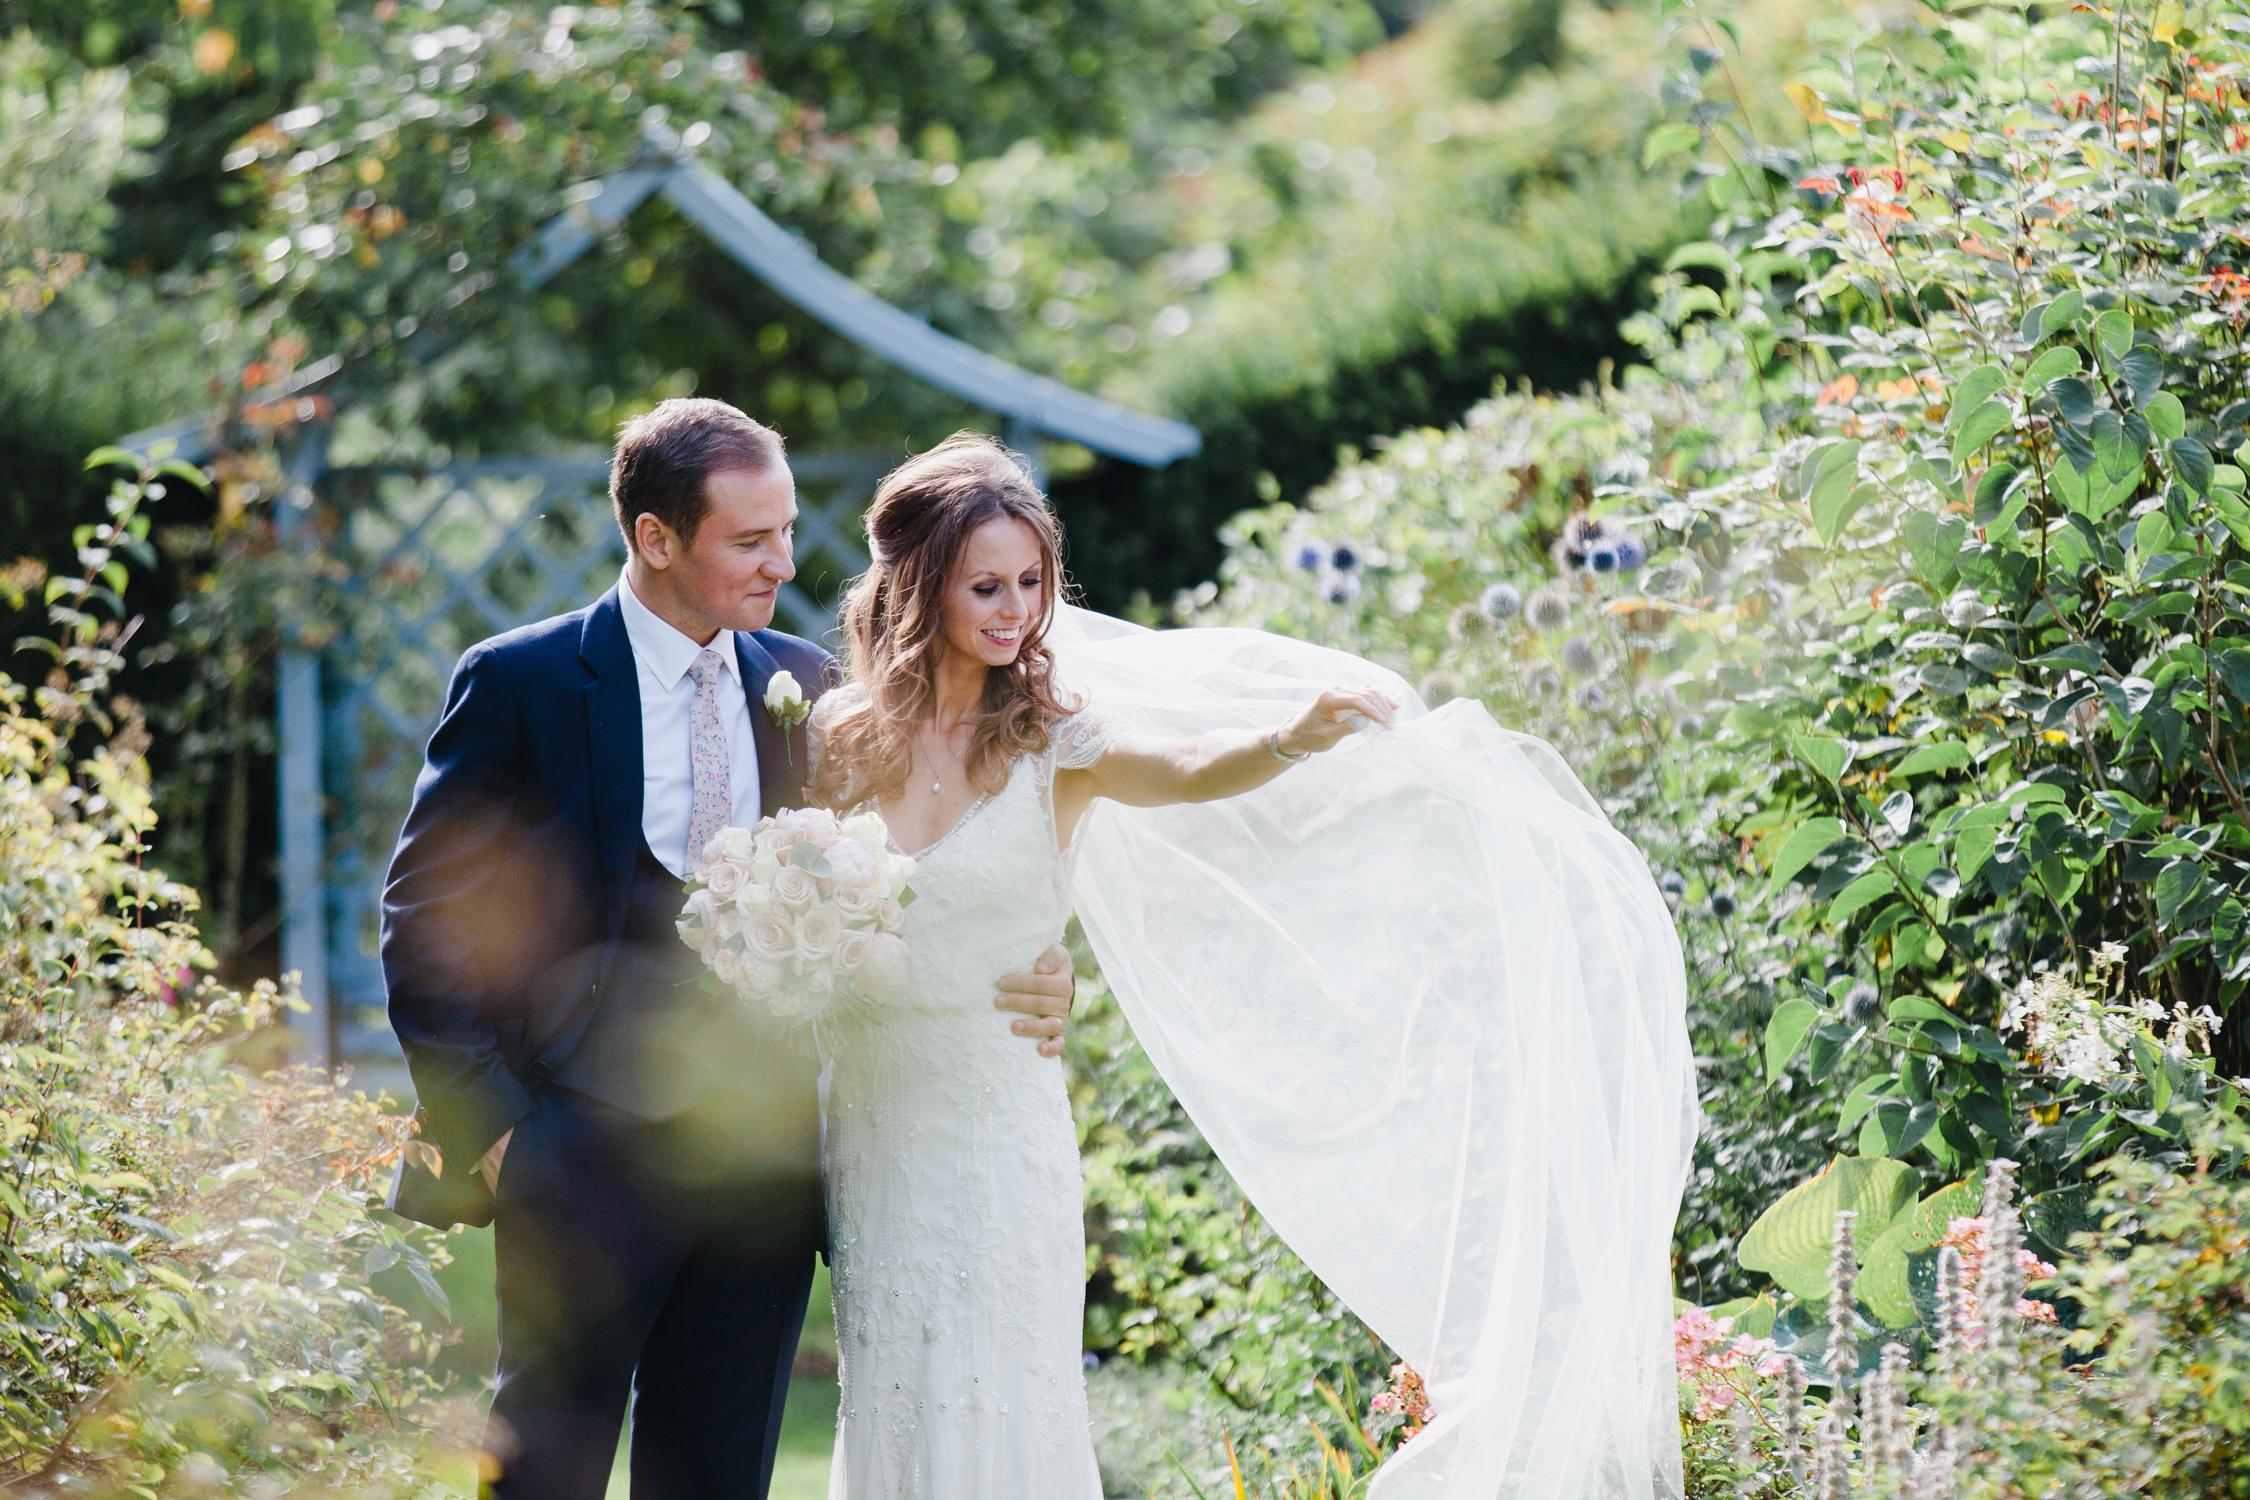 Dorfold Hall wedding for a Jenny Packham bride.